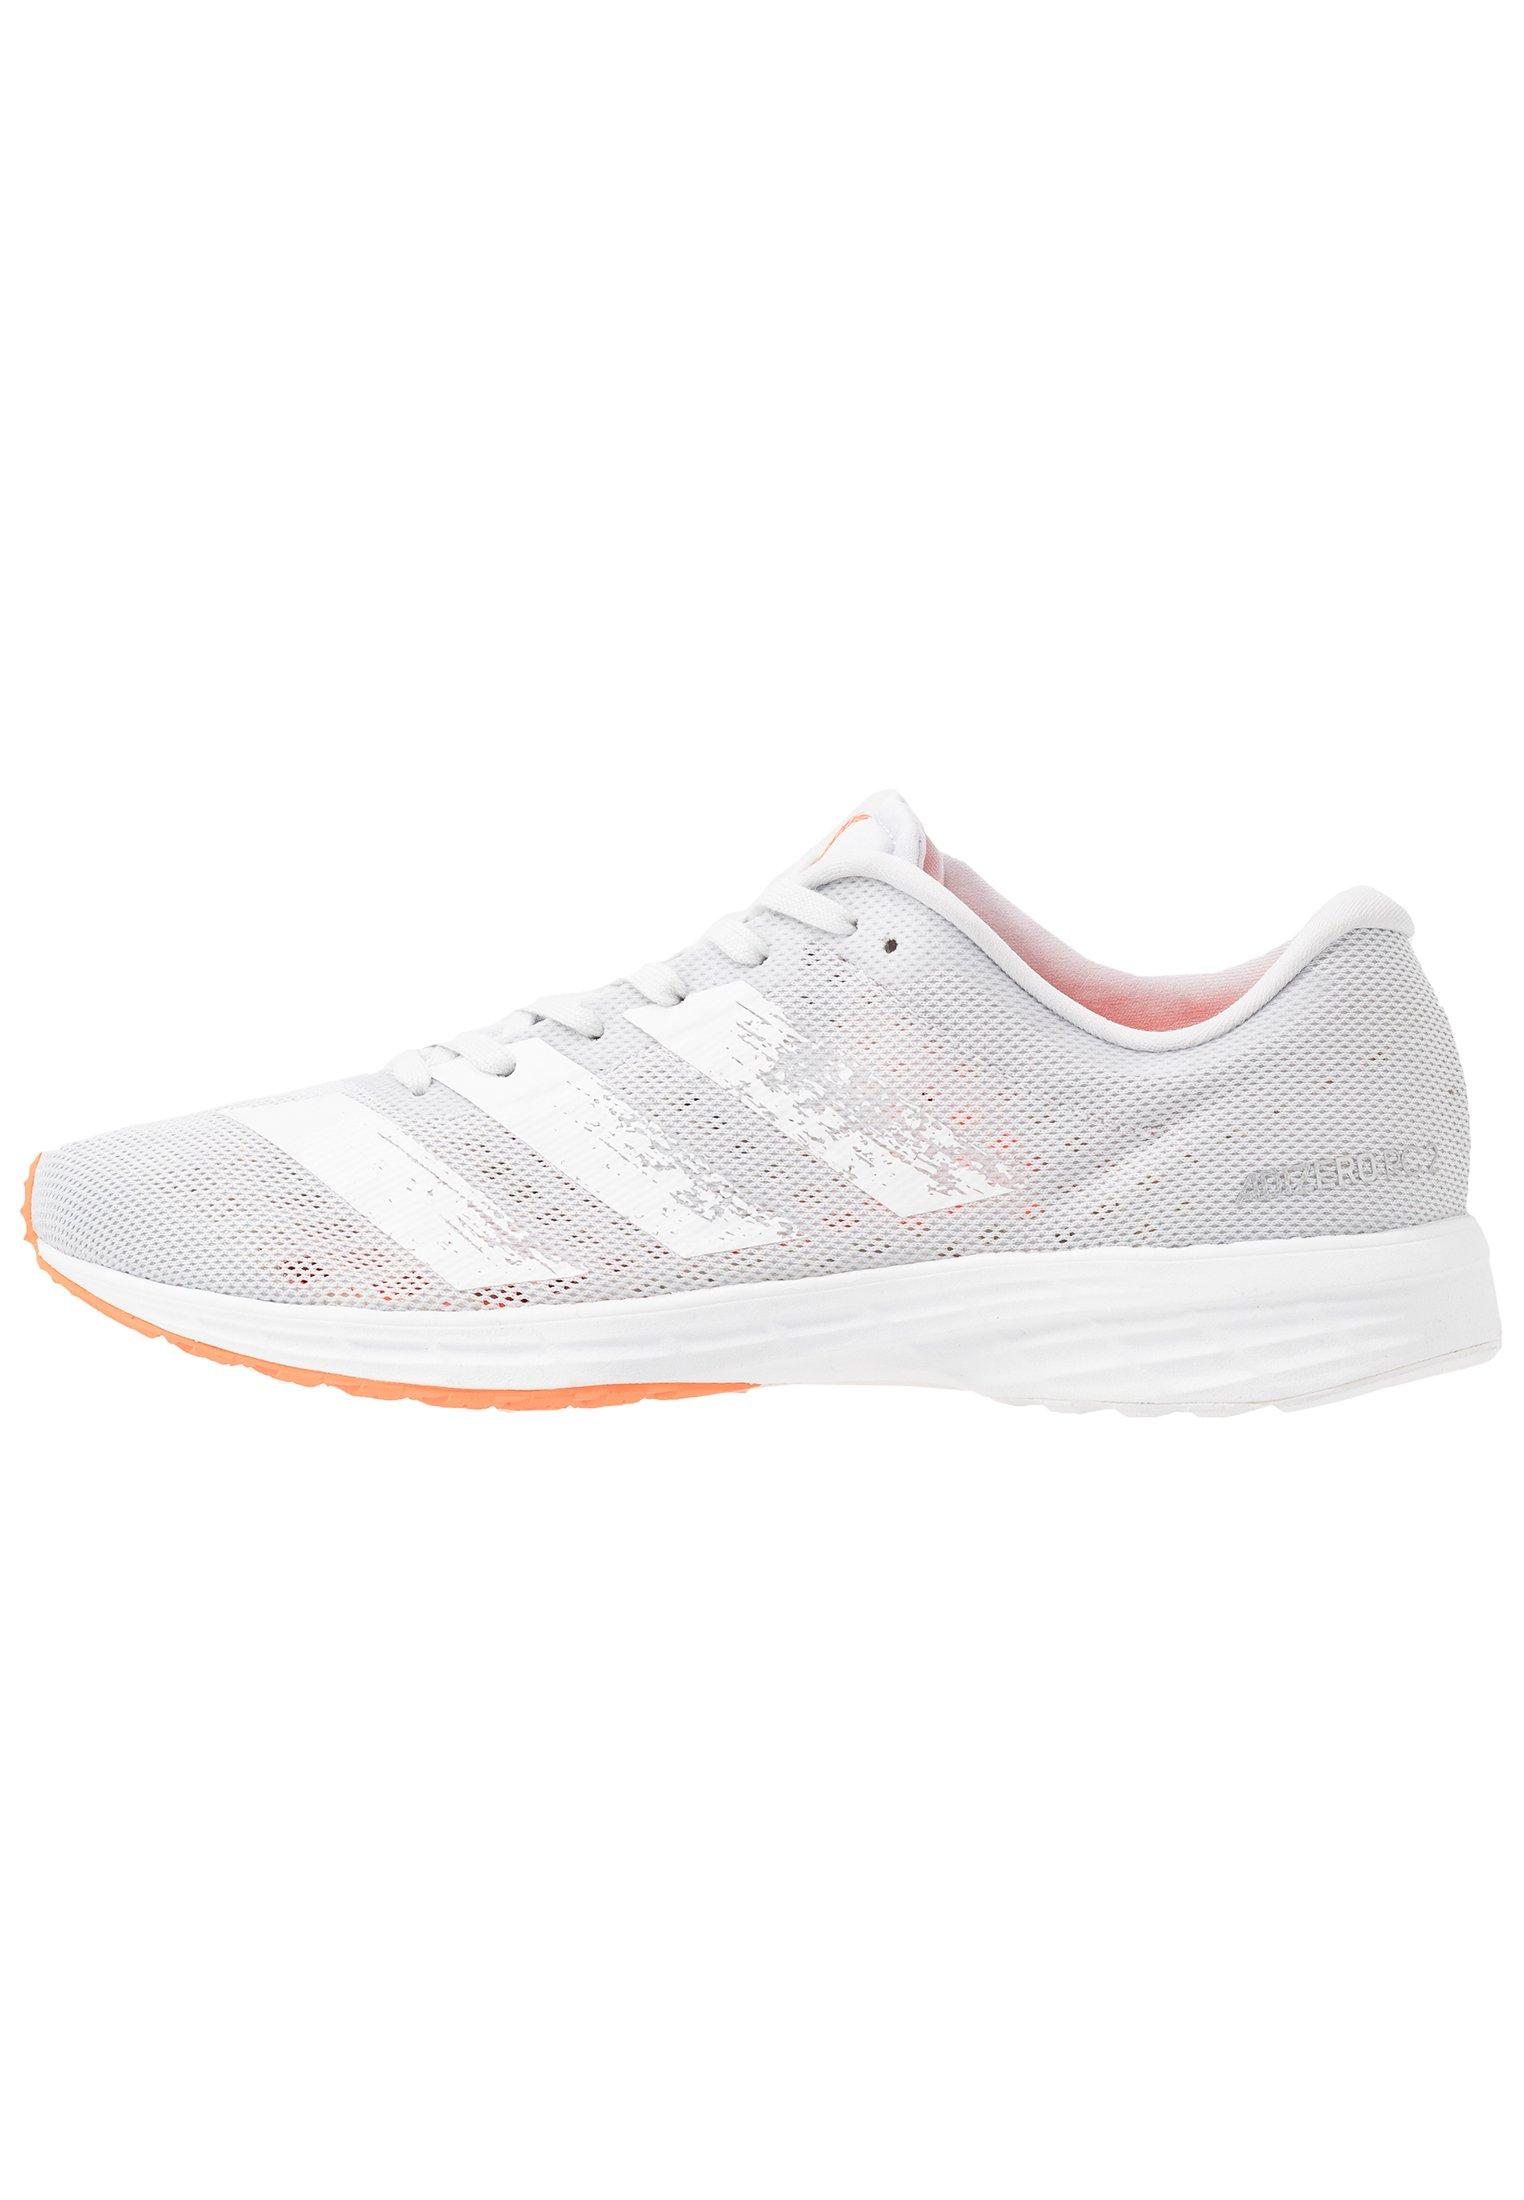 ADIZERO RC 2 Laufschuh Neutral dash greyfootwear whitesignal coral